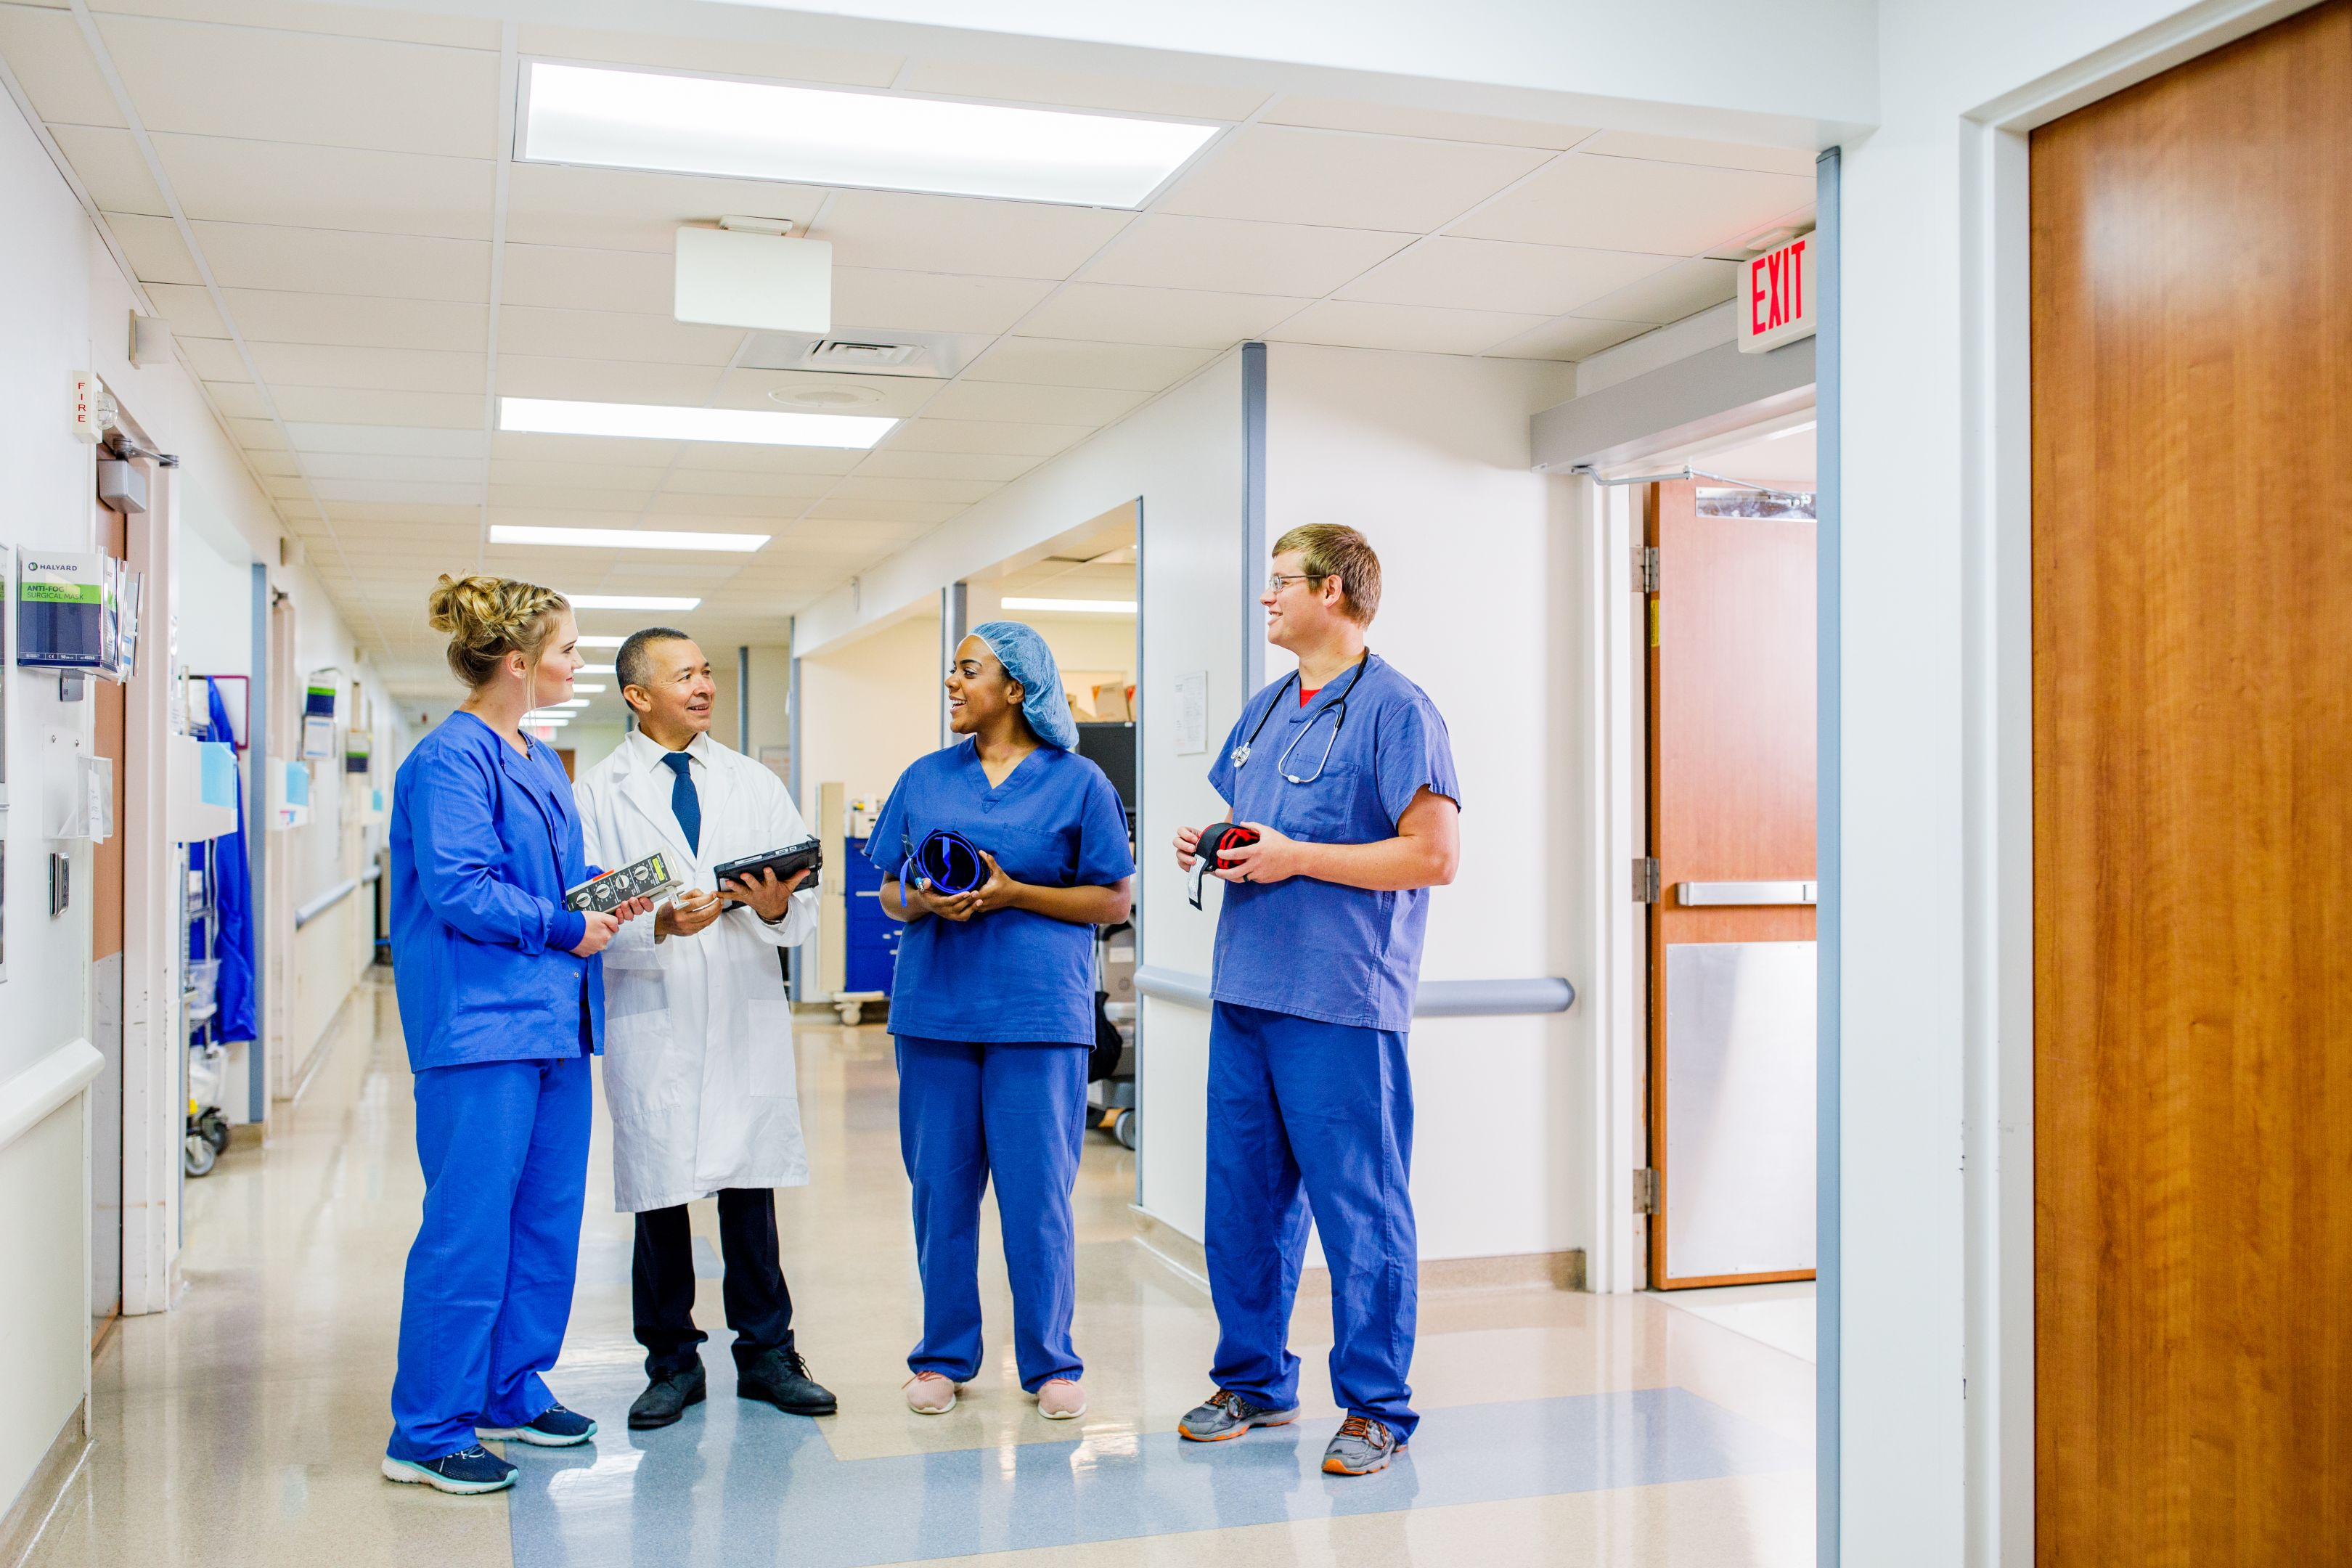 Medical Office Assistant Certificate Program